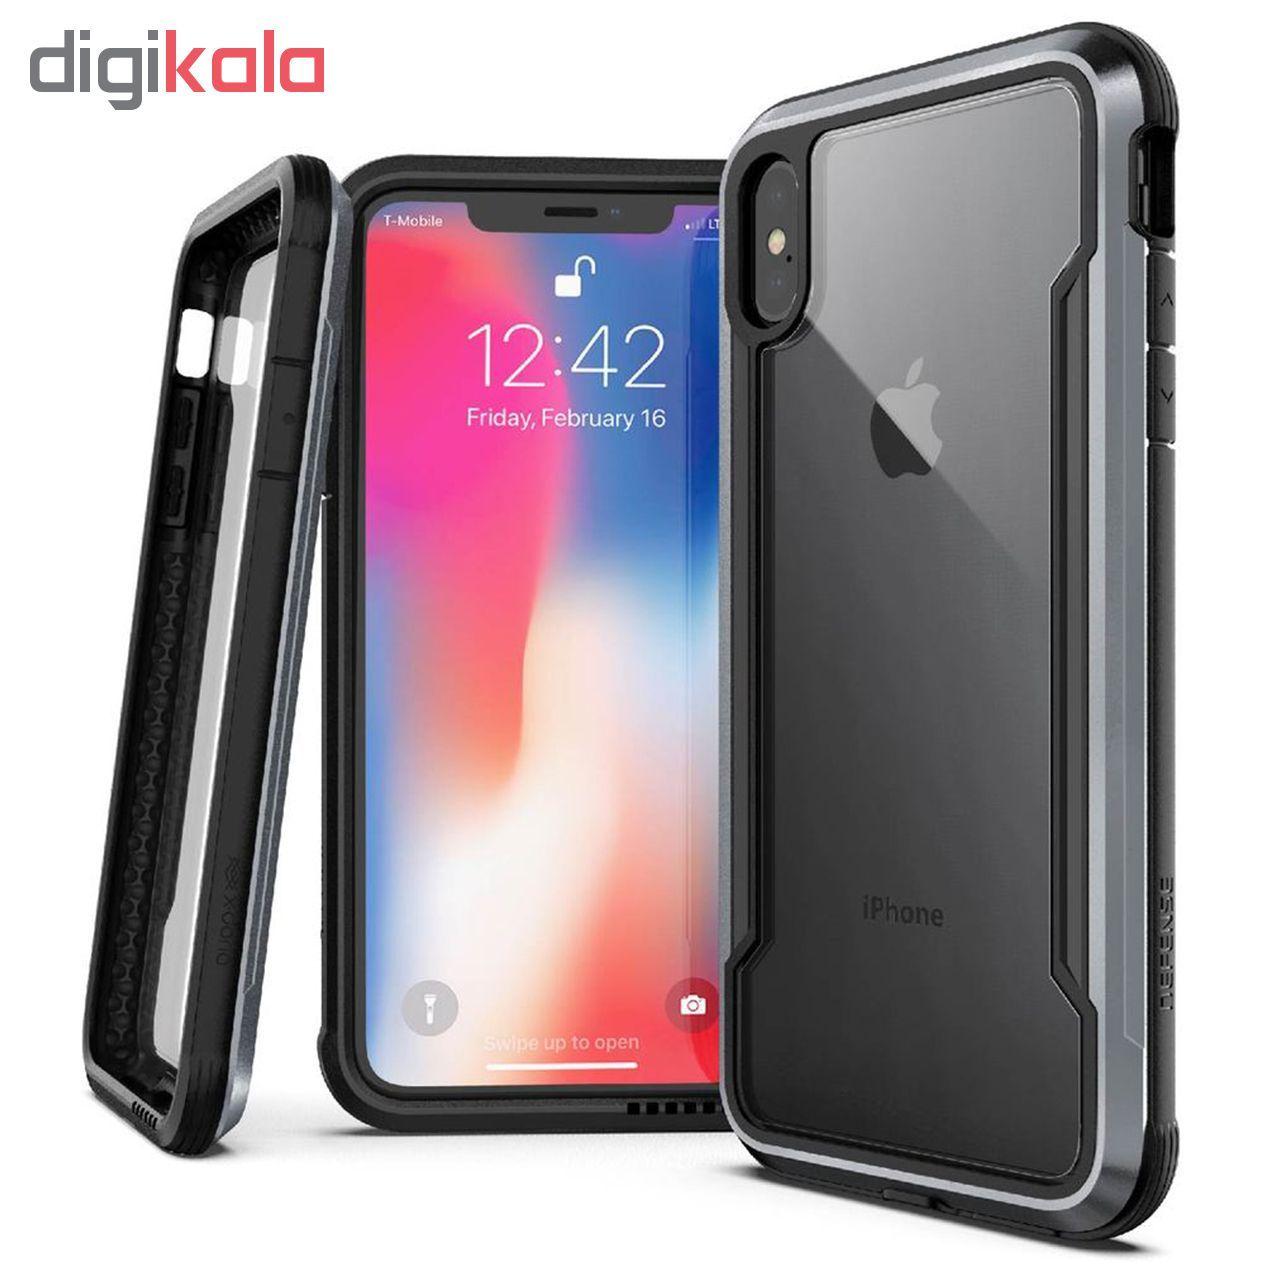 کاور ایکس دوریا مدل Defense Shield مناسب برای گوشی موبایل اپل IPhone Xs Max main 1 2